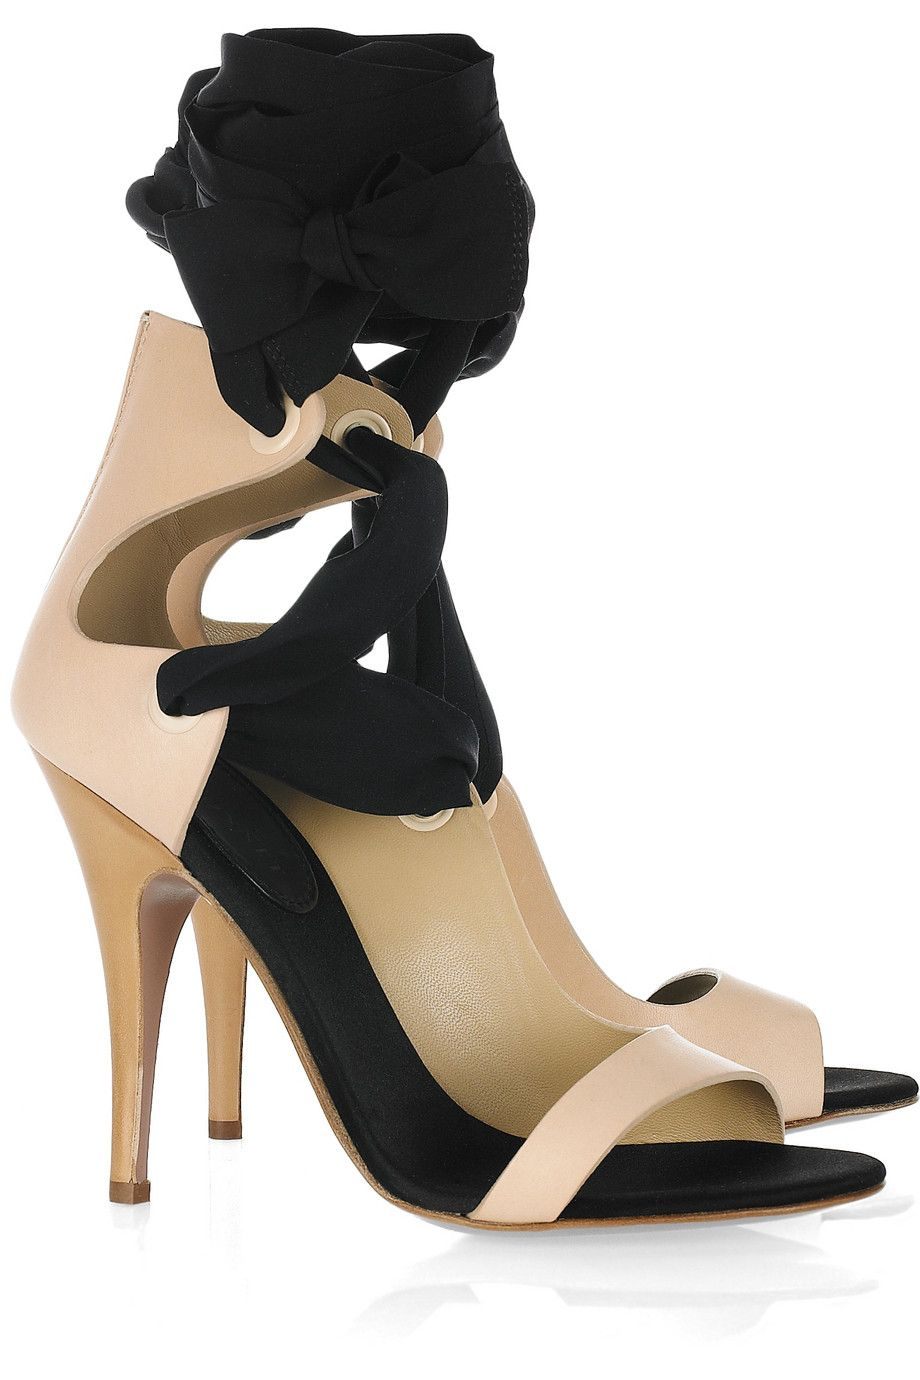 Vionnet Leather Heels